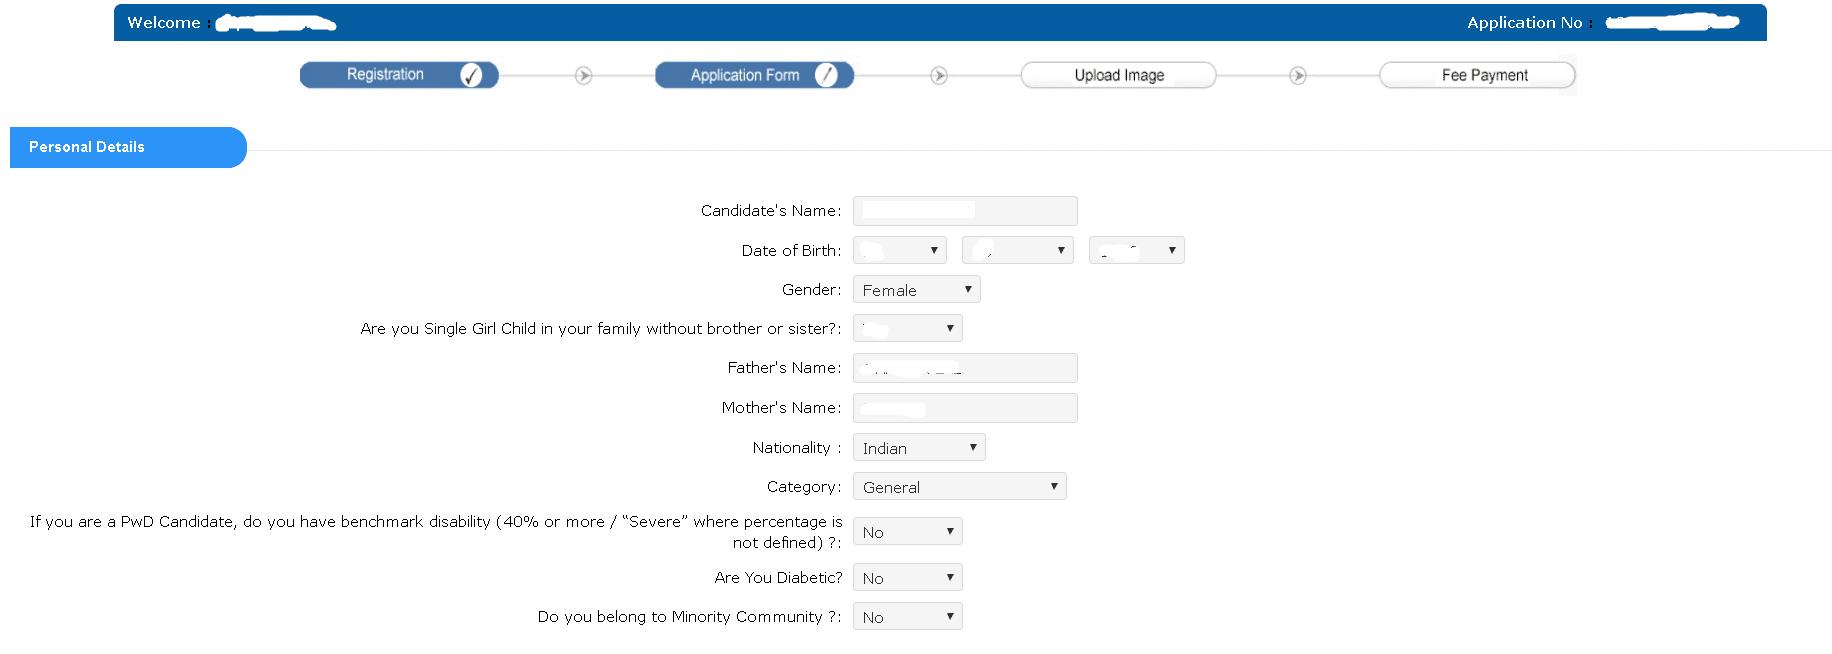 UGC NET Personal Details 2